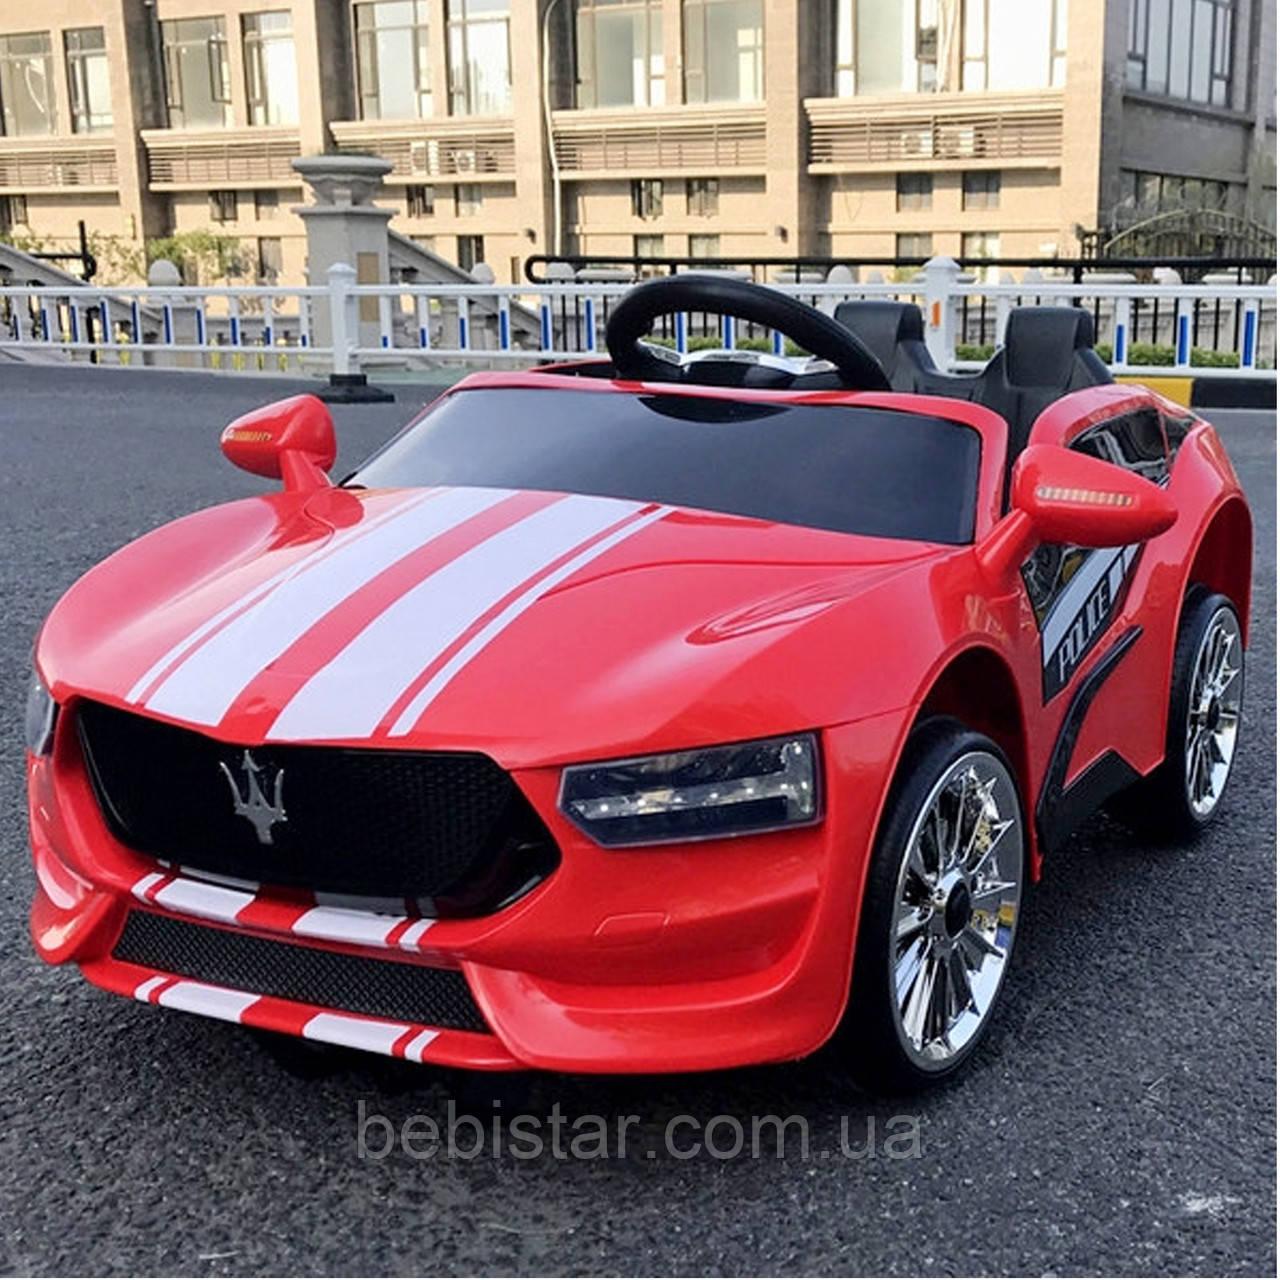 Электромобиль спорткар T-7624 RED для деток 3-8 лет с пультом мотор 2*20W с MP3